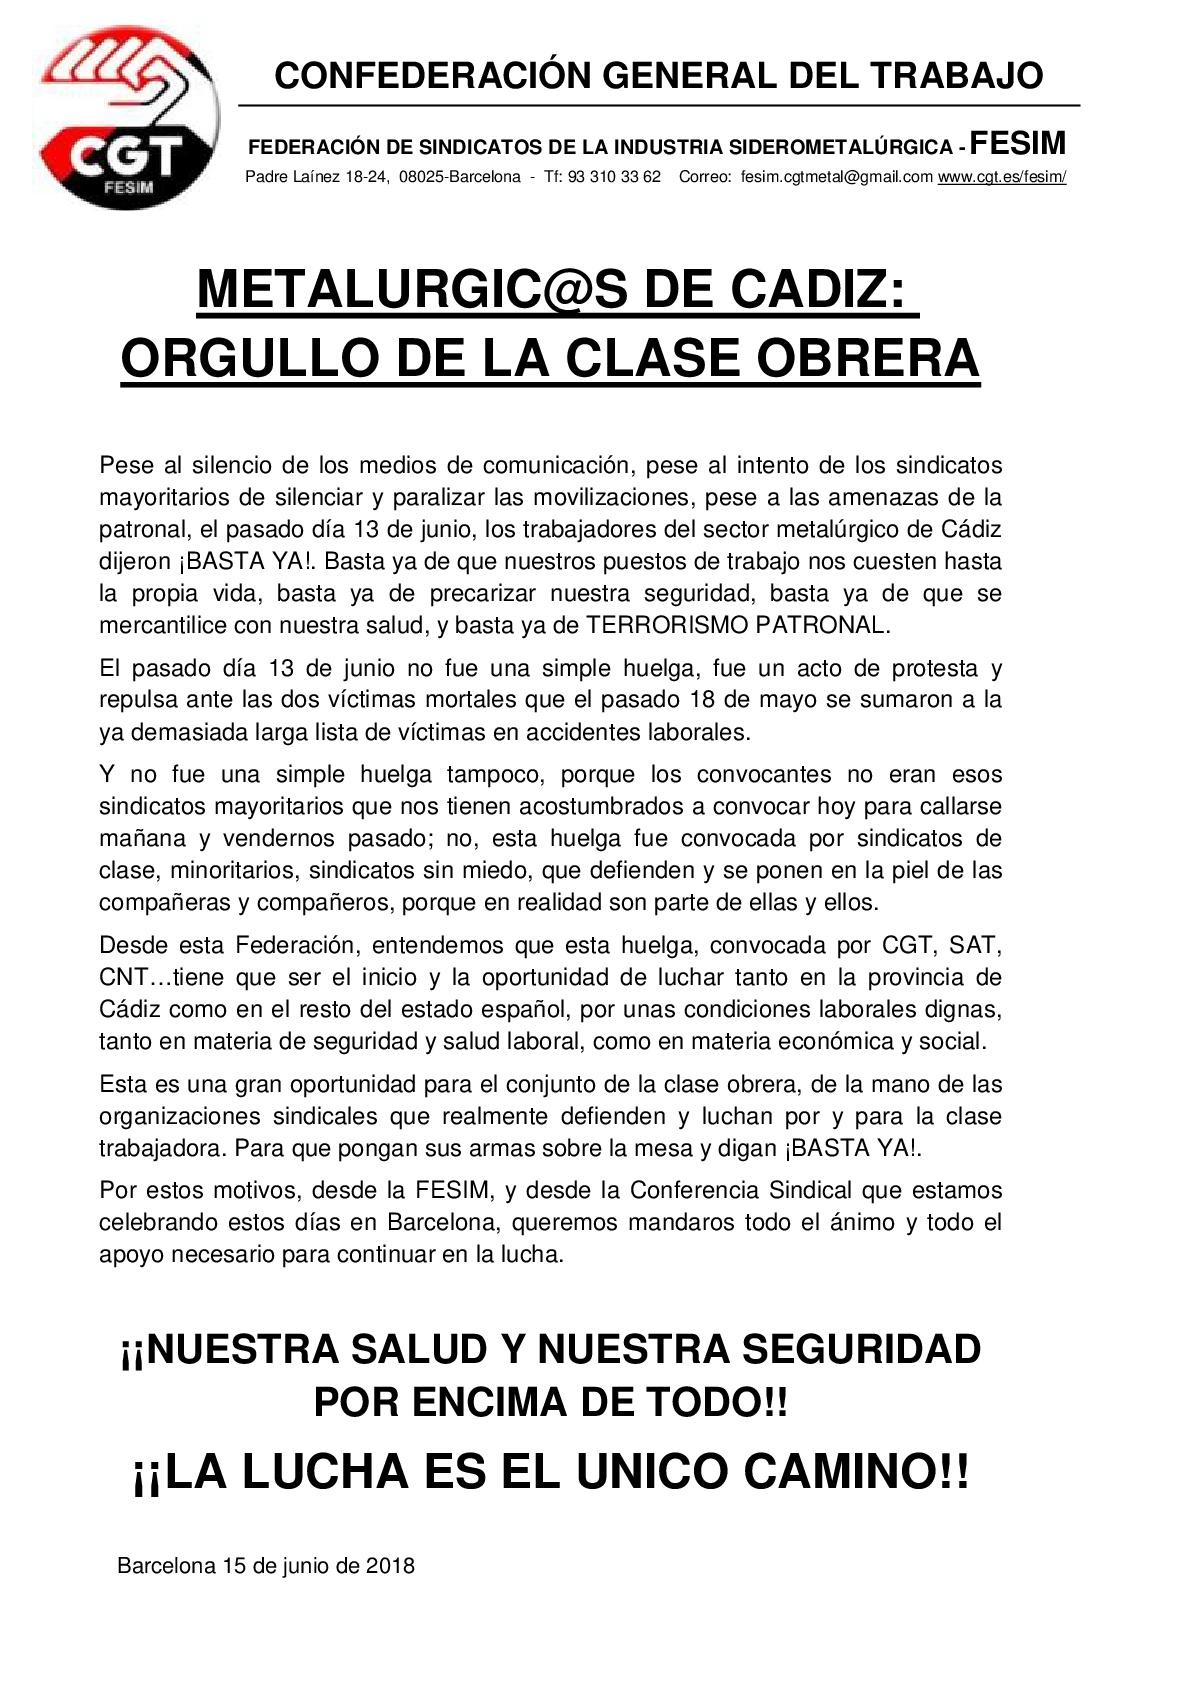 Resolucion Huelga Metal Cadiz-001